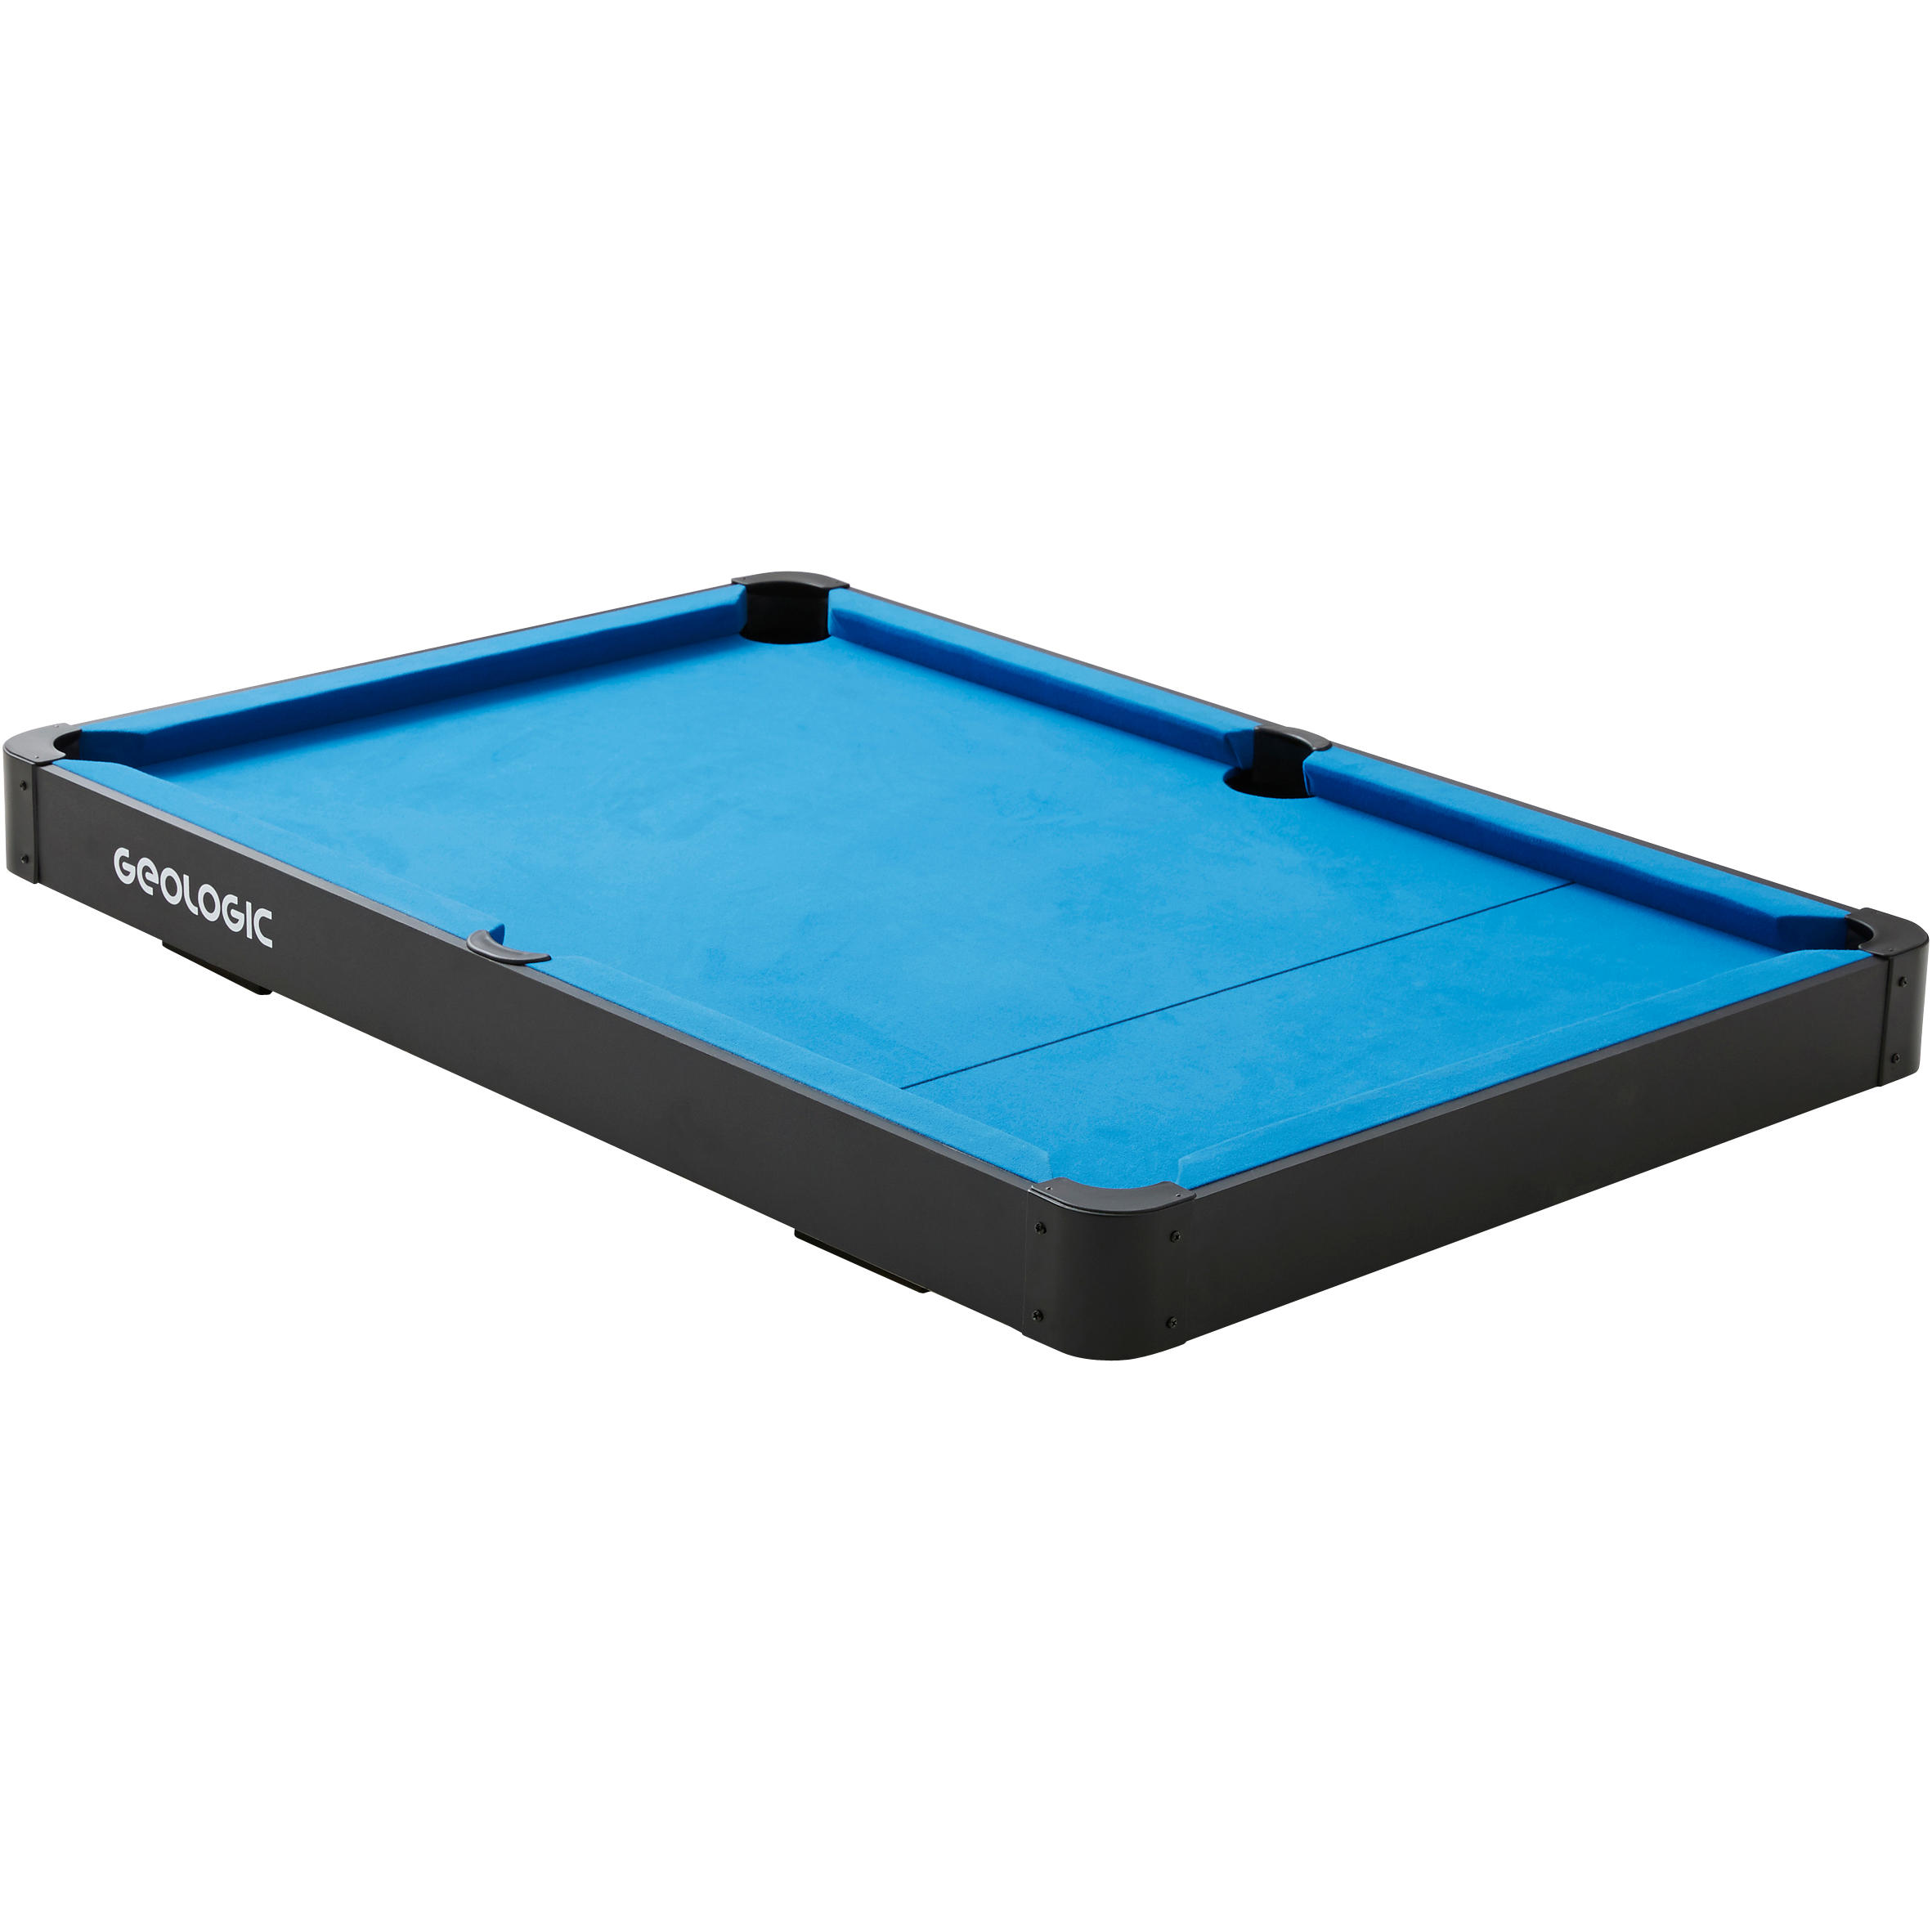 BT 100 Pool Set